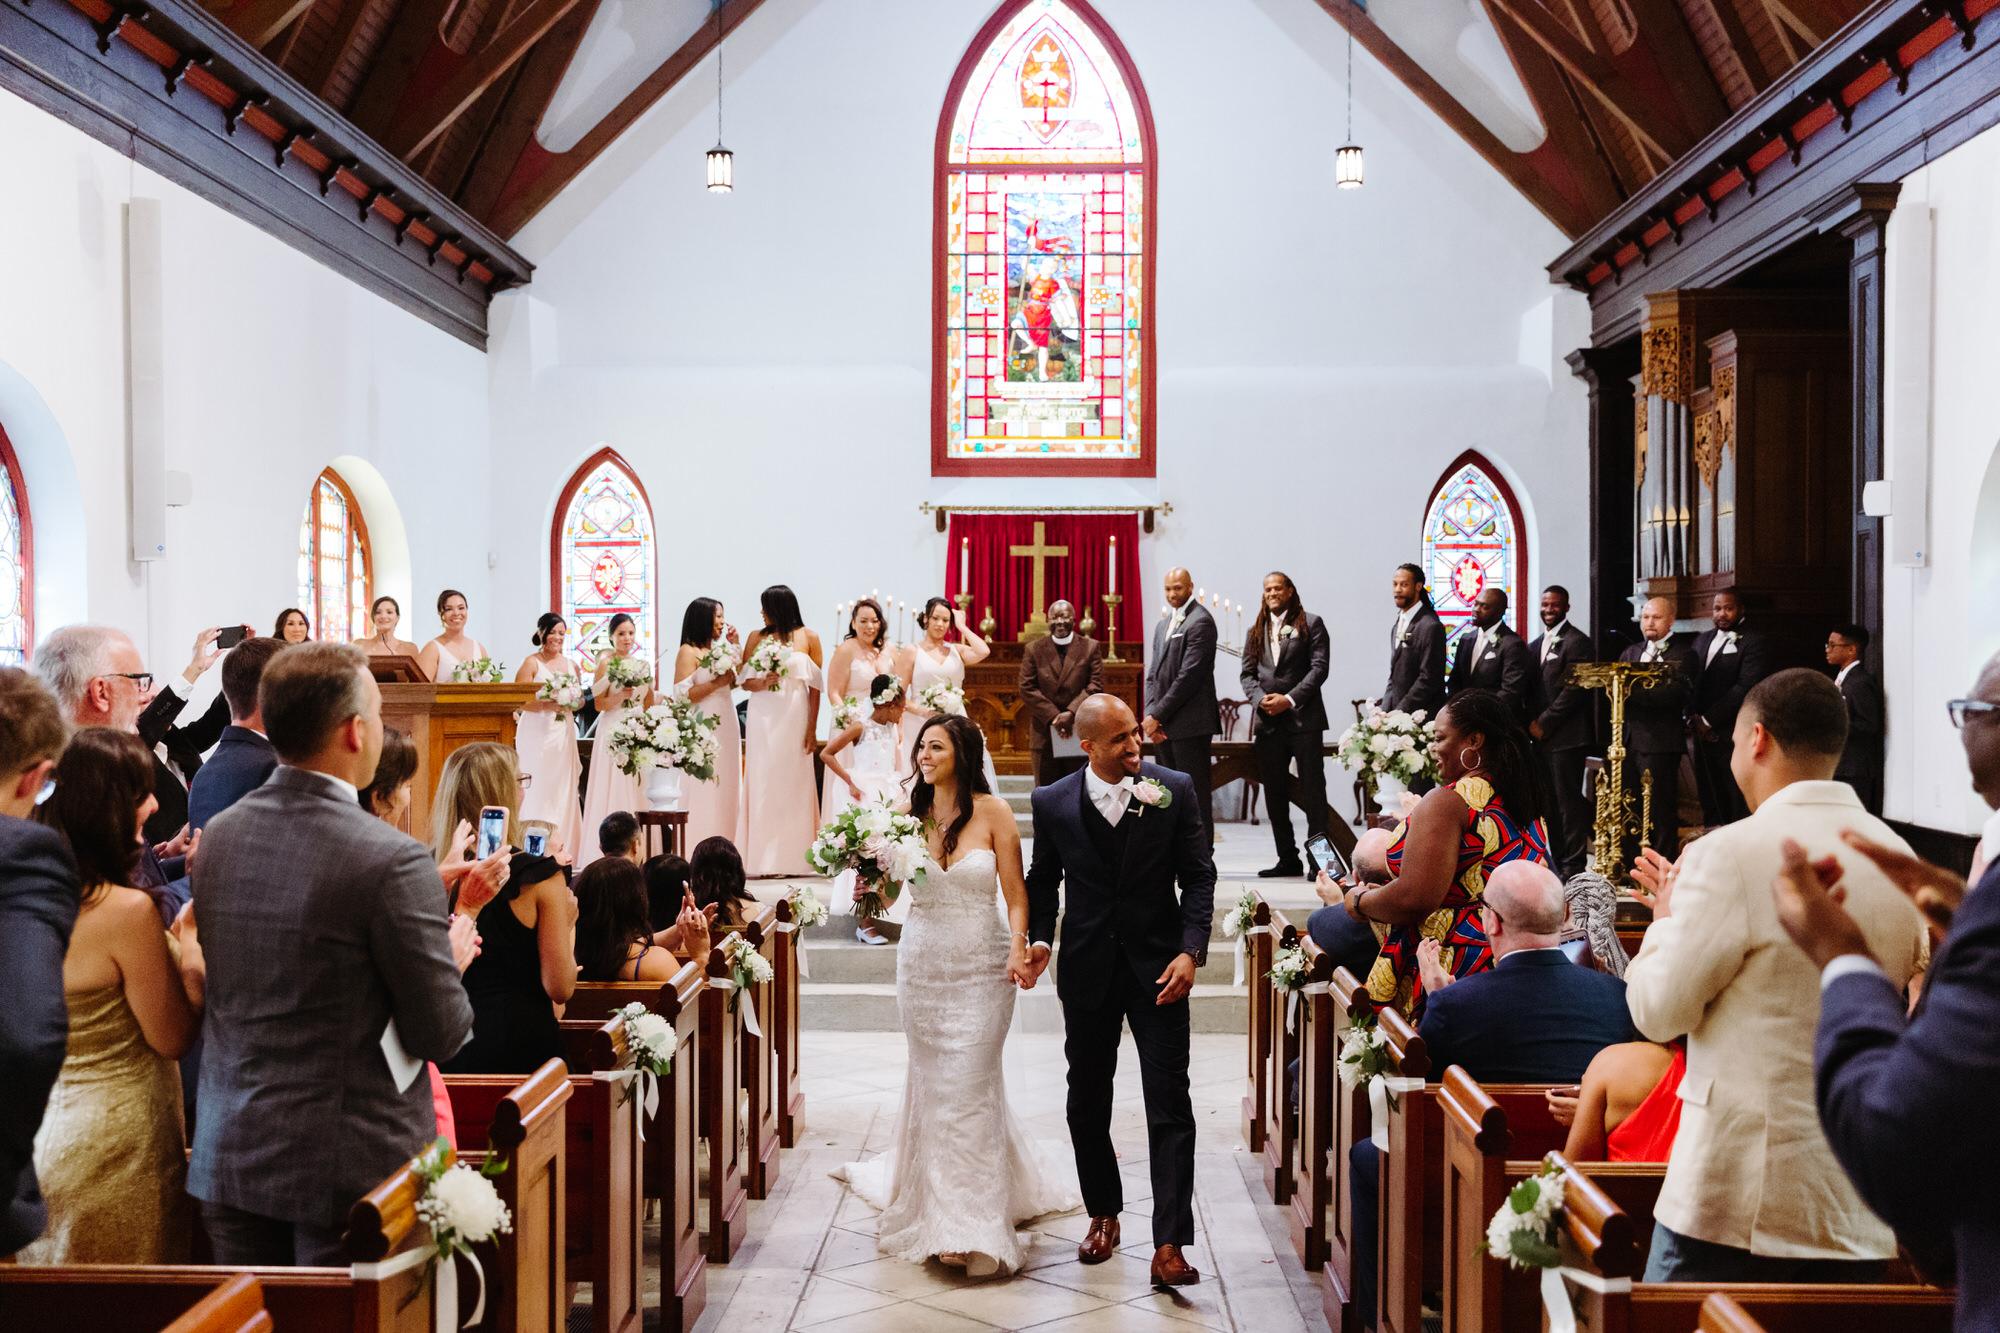 st-lukes-chapel-cannon-green-charleston-wedding-935.JPG